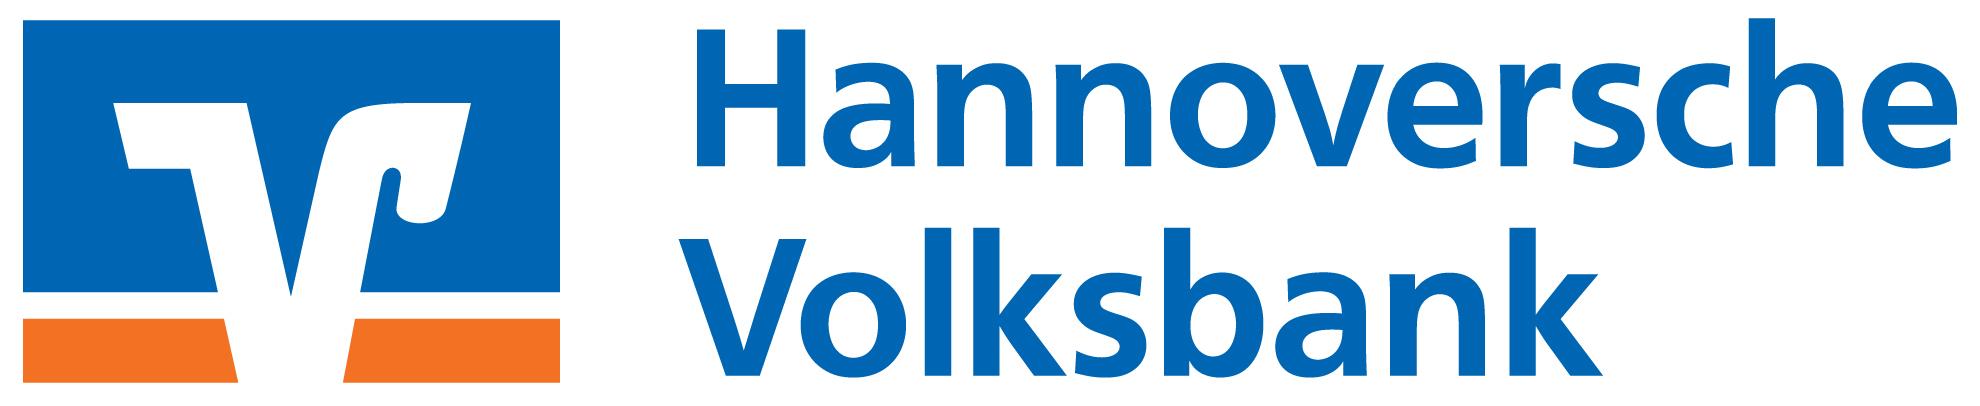 Hannoversche Volksbank eG Geldautomat Hannover (96 FanShop)